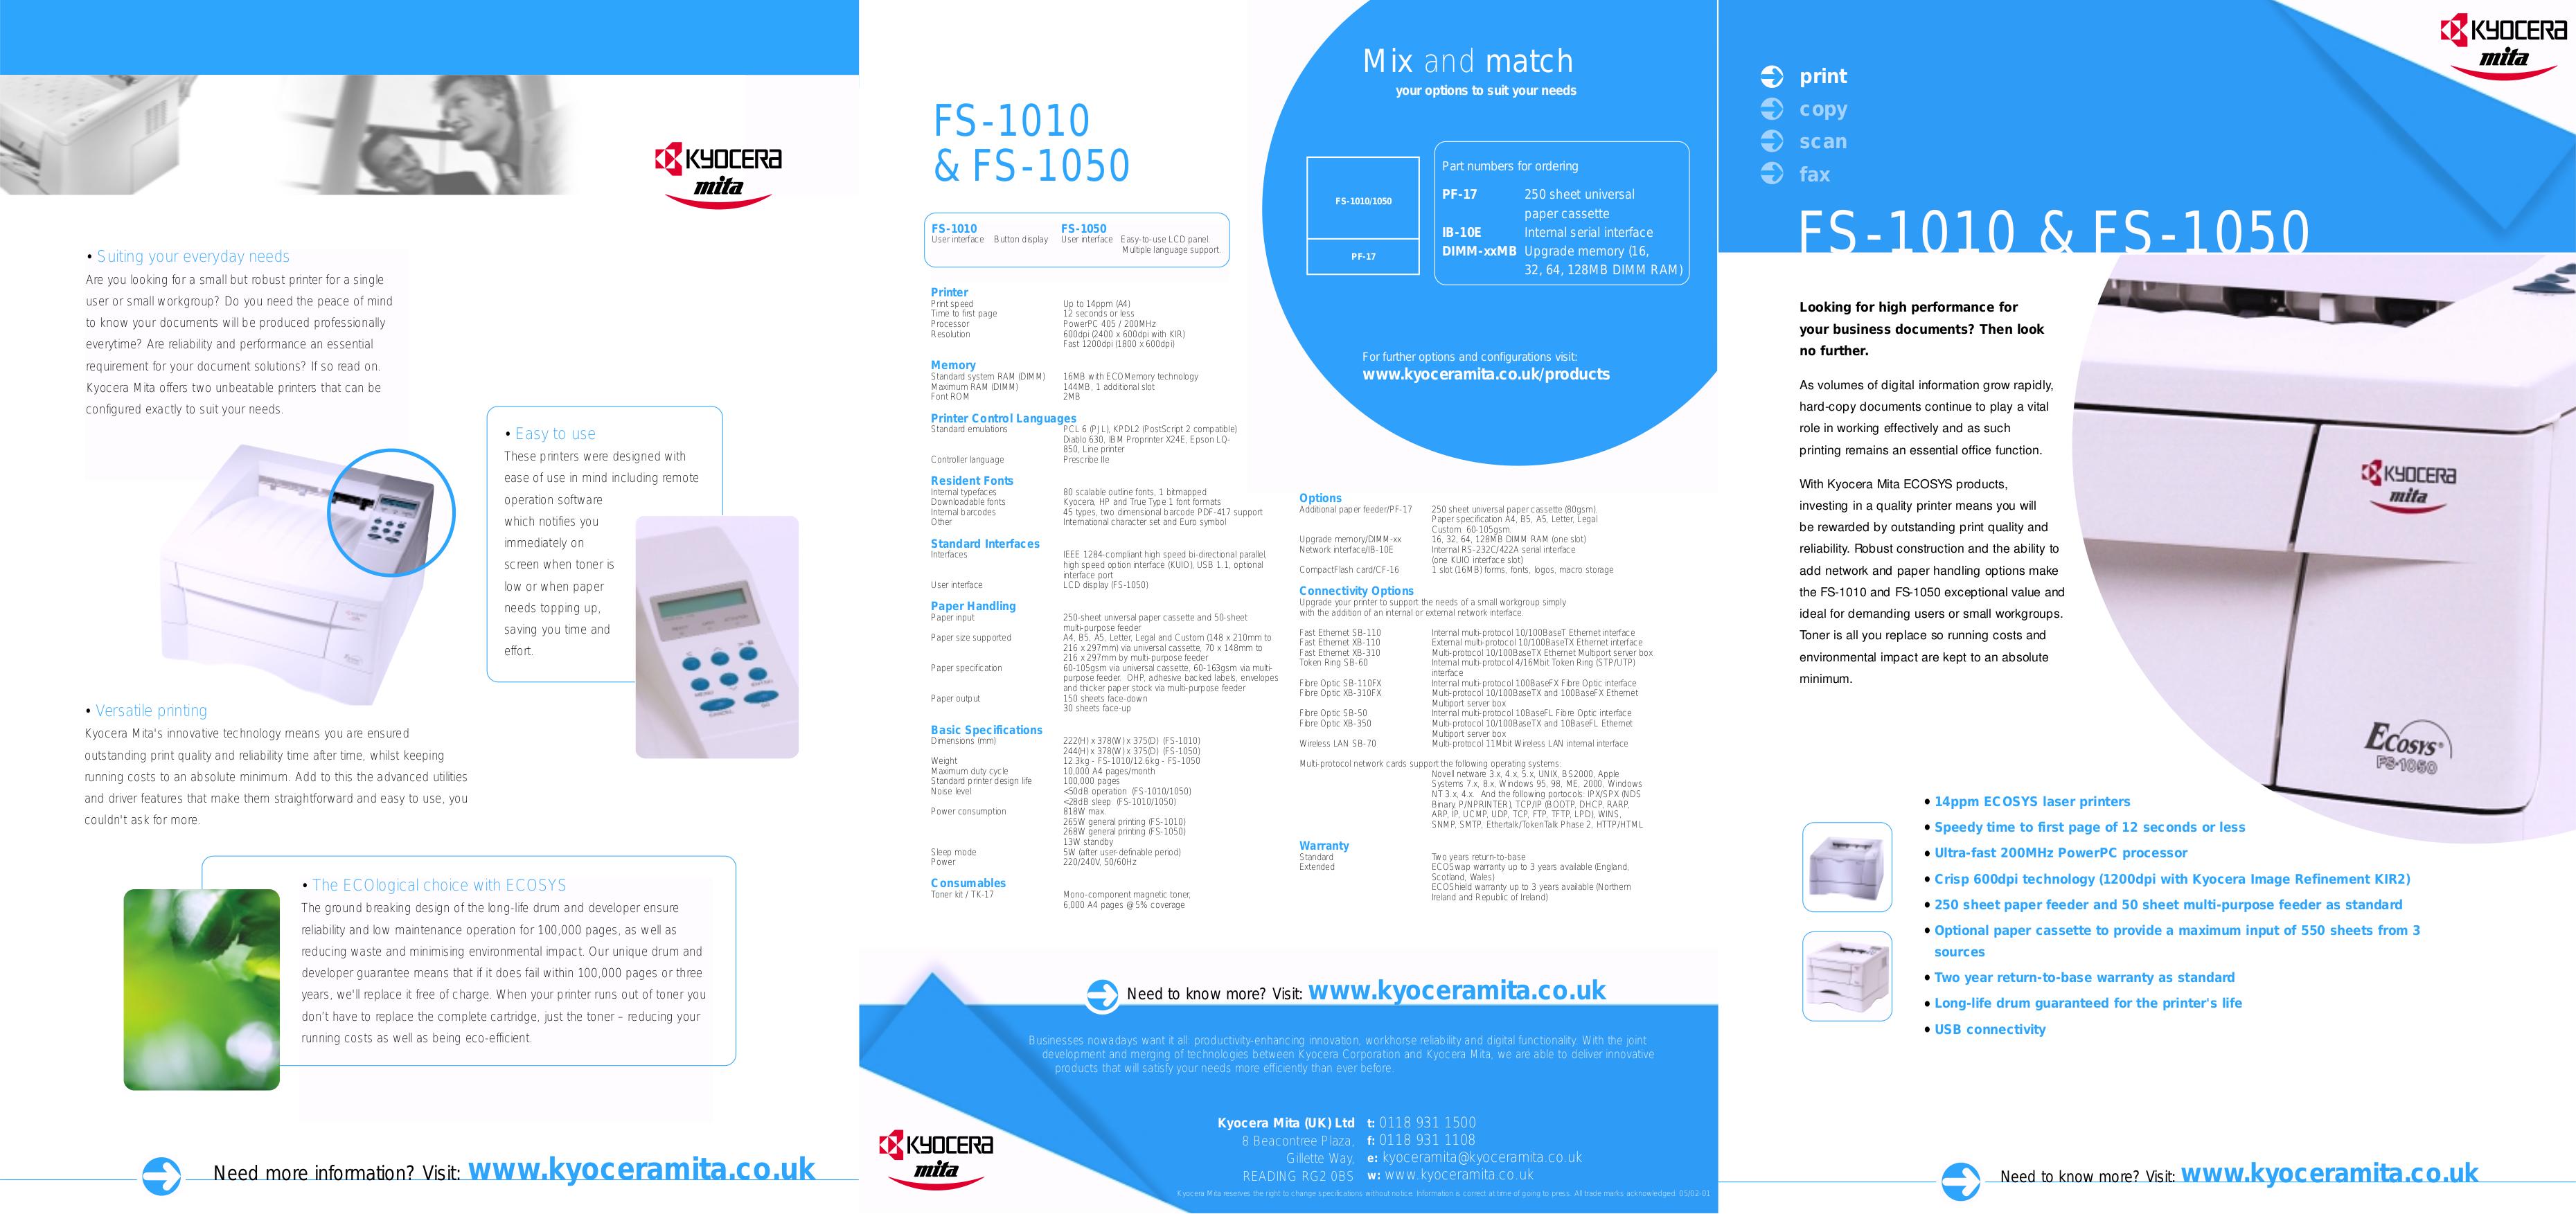 Download free pdf for Kyocera FS-1010 Printer manual